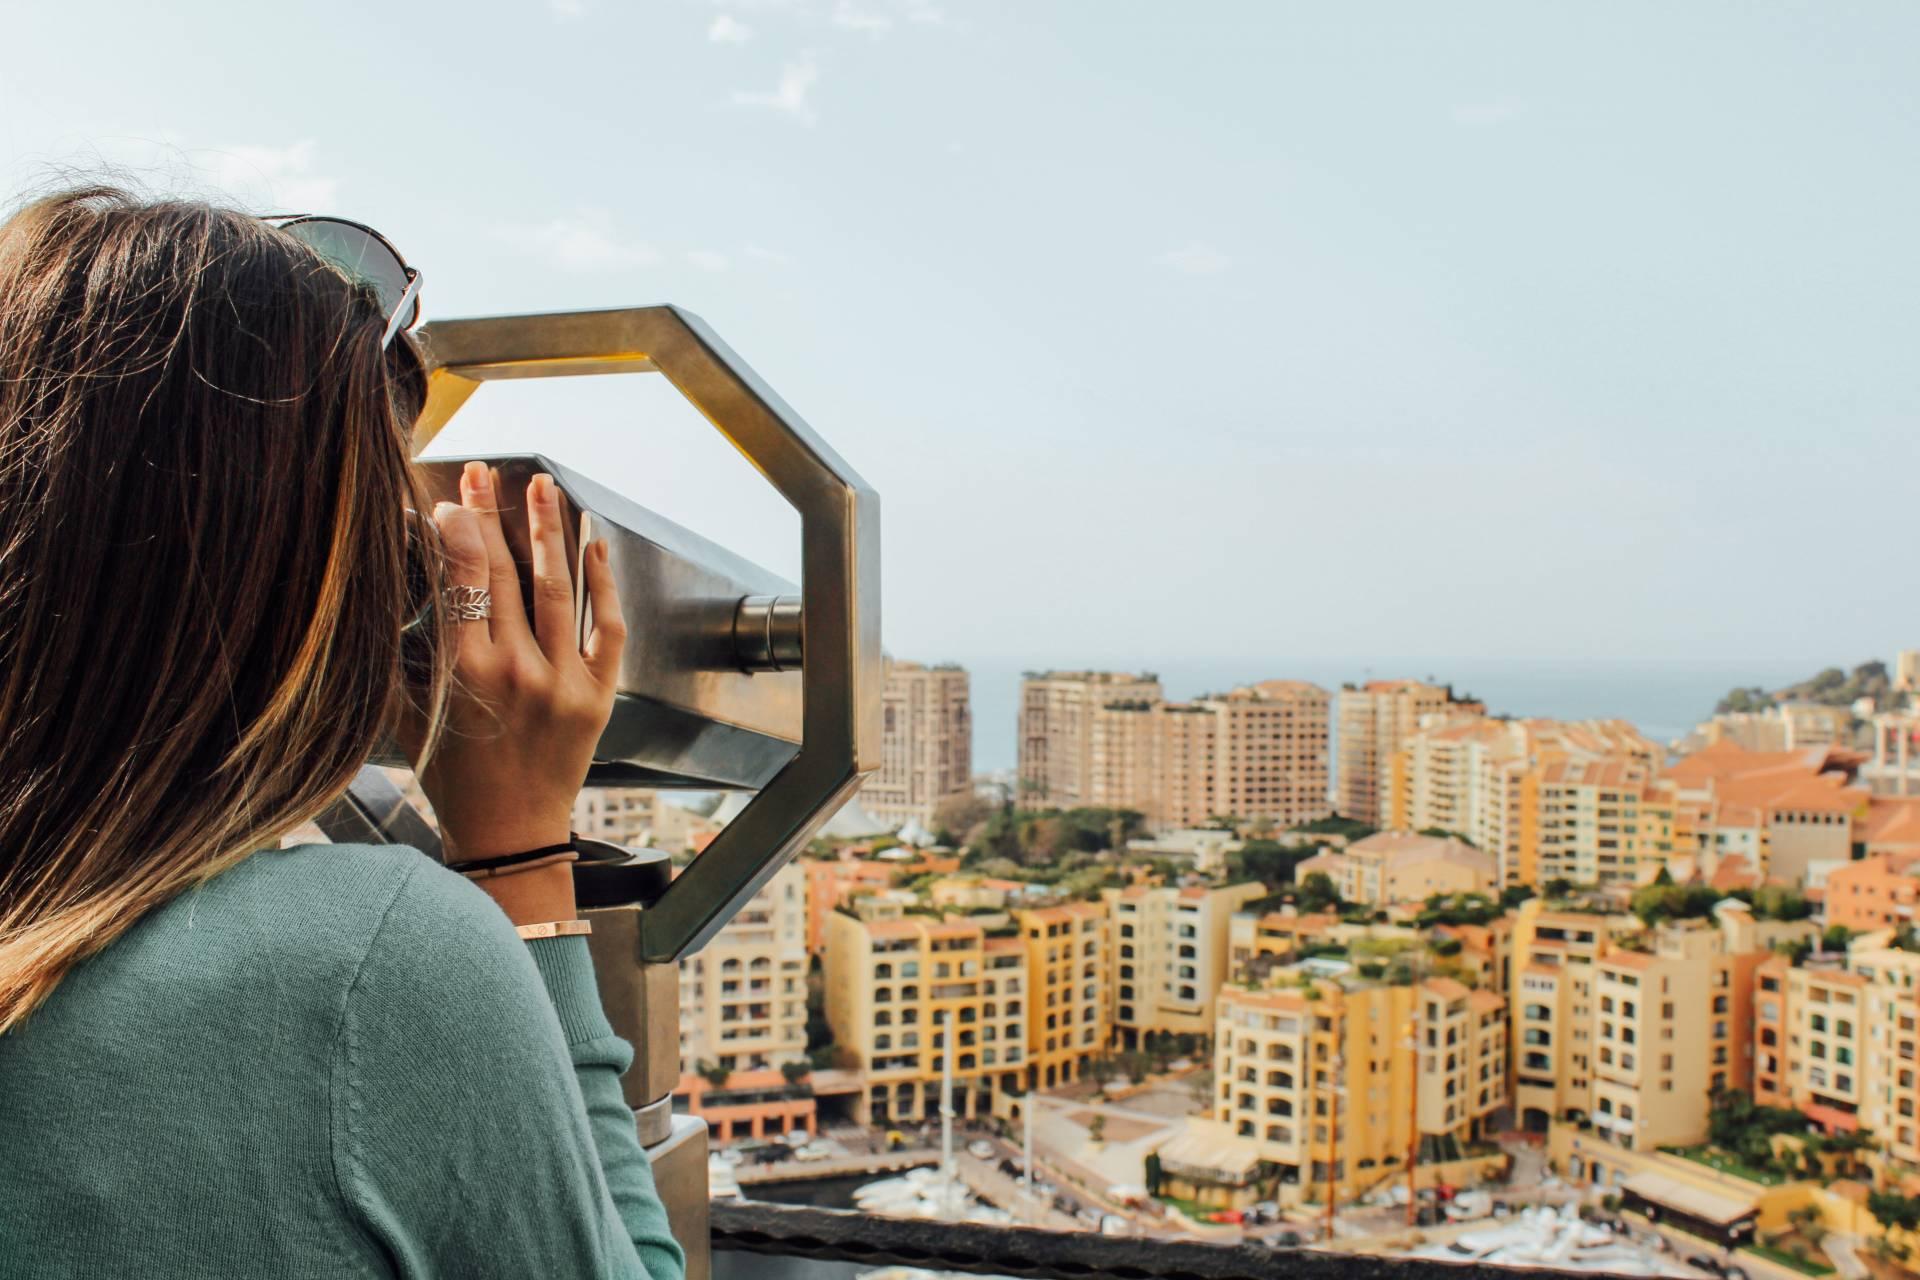 Monte-Carlo lookout in Monaco